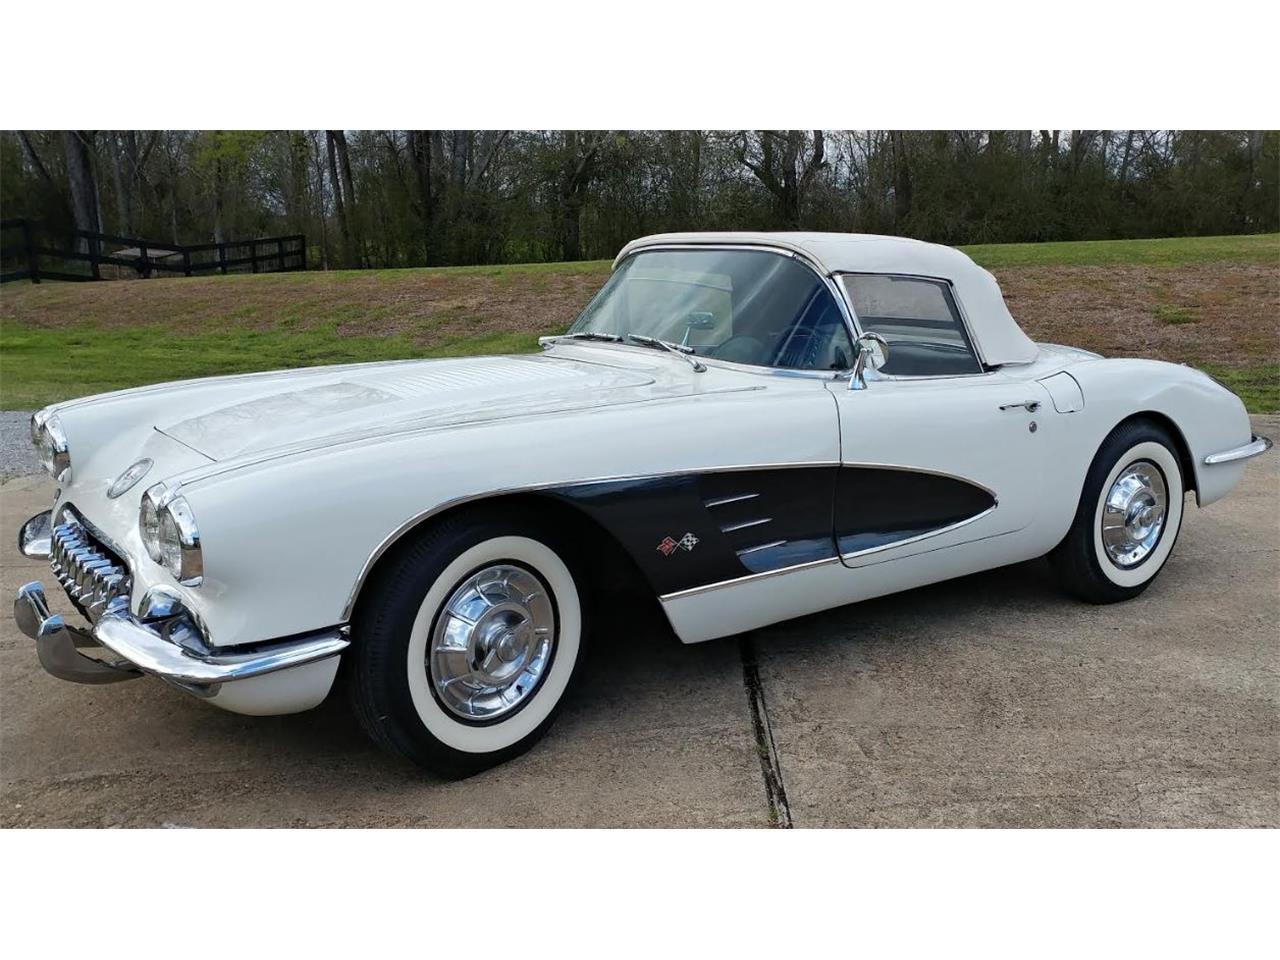 1958 Corvette Wiring Diagram Temp Posts Chevrolet For Sale Classiccars Com Cc 969423 1960